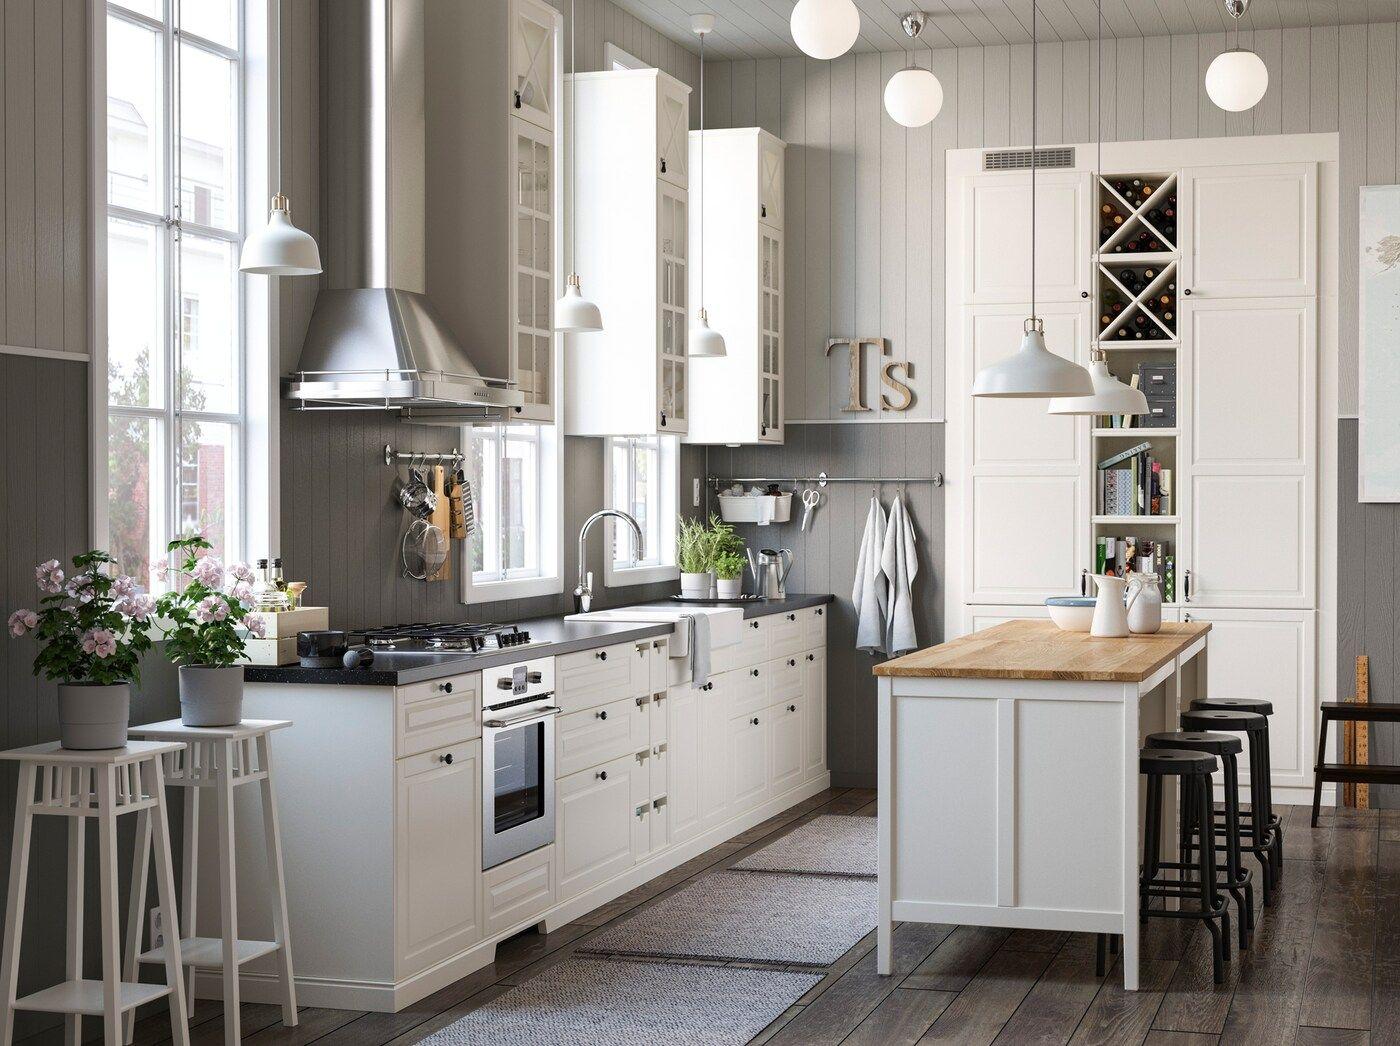 Countryside Kitchen In The City Ikea Malaysia Ikea Kitchen Inspiration Ikea Kitchen Storage White Ikea Kitchen